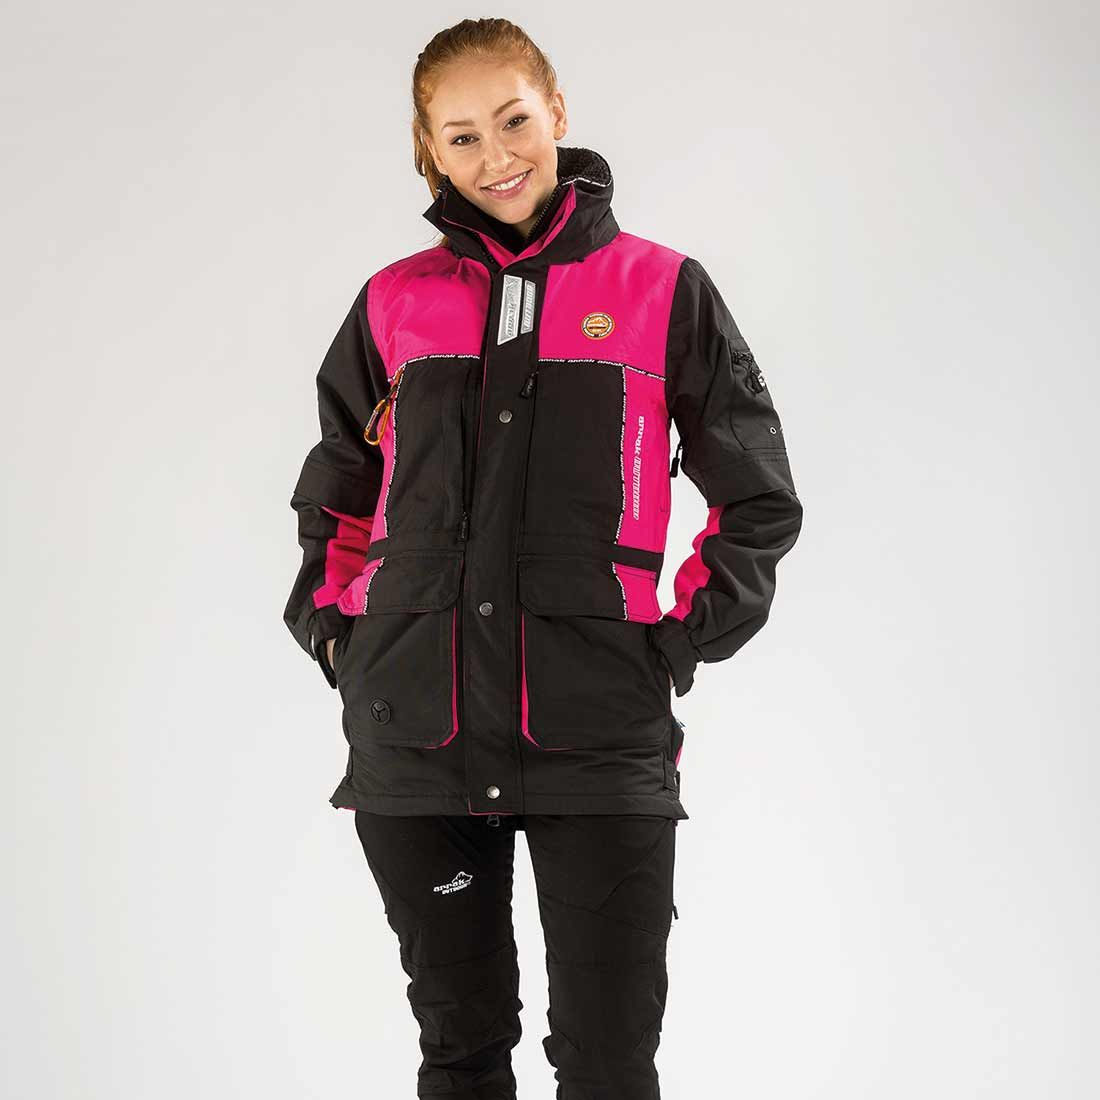 Arrak New Original Jacket Pink/Black M